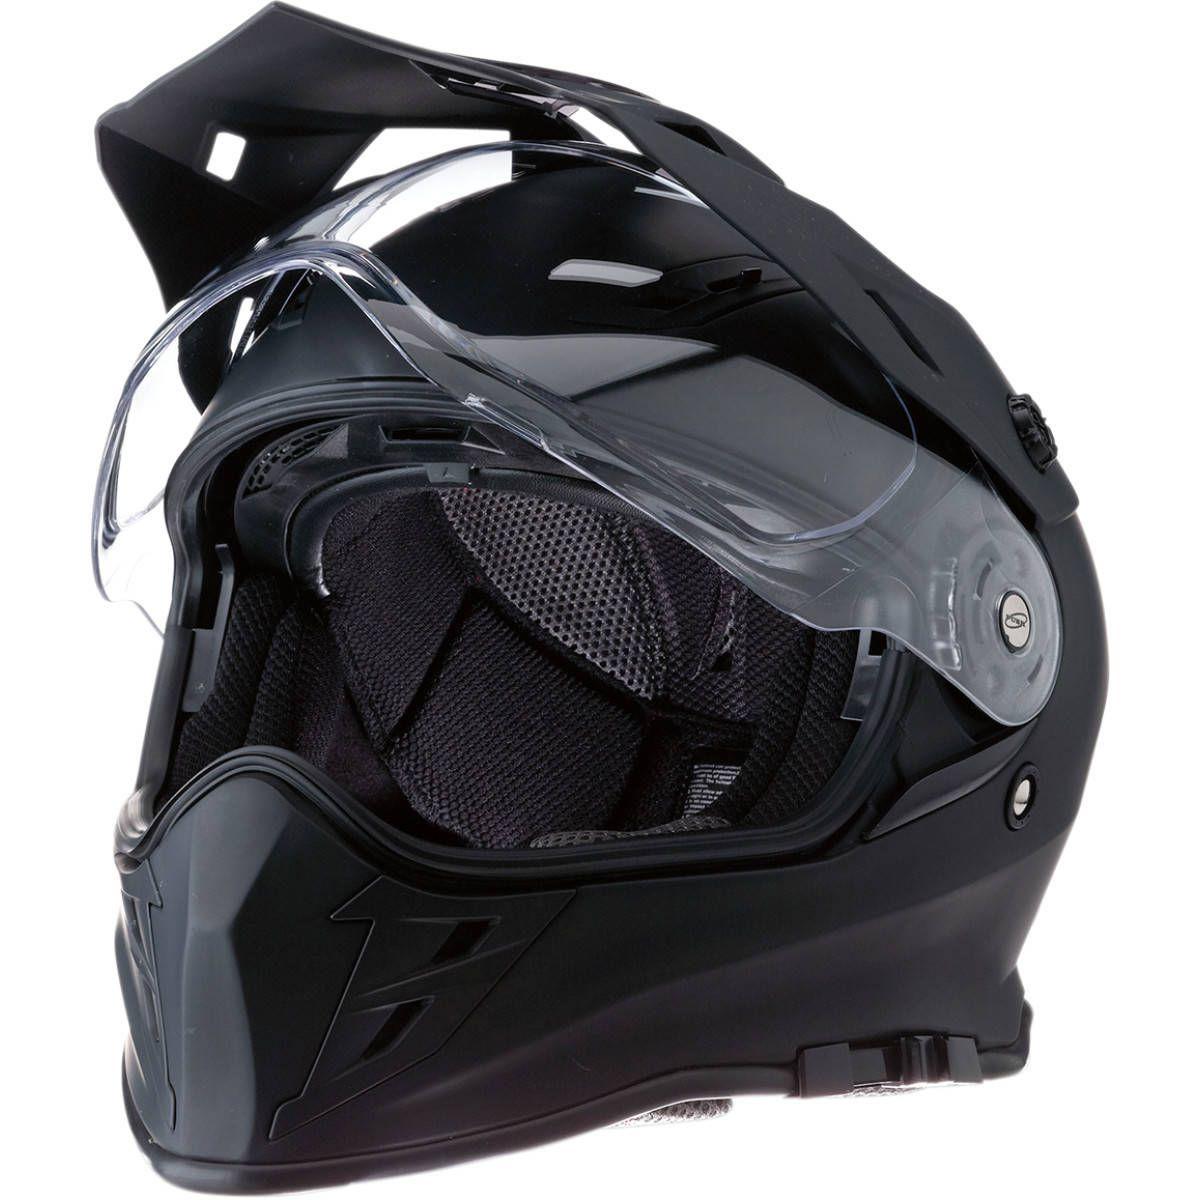 range-dual-sport-helmet-matte-black-xs-0101-10868--1